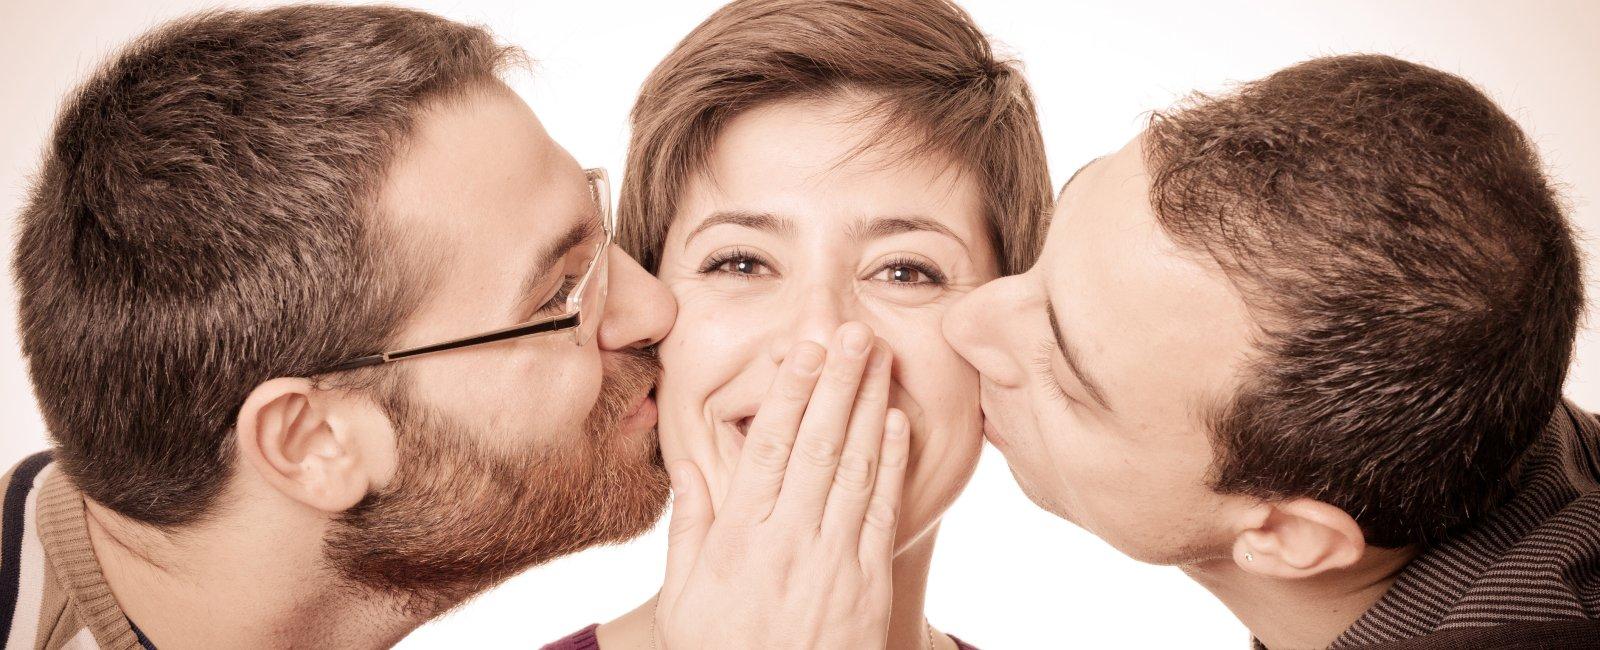 Spanish Alternative Swingers Dating